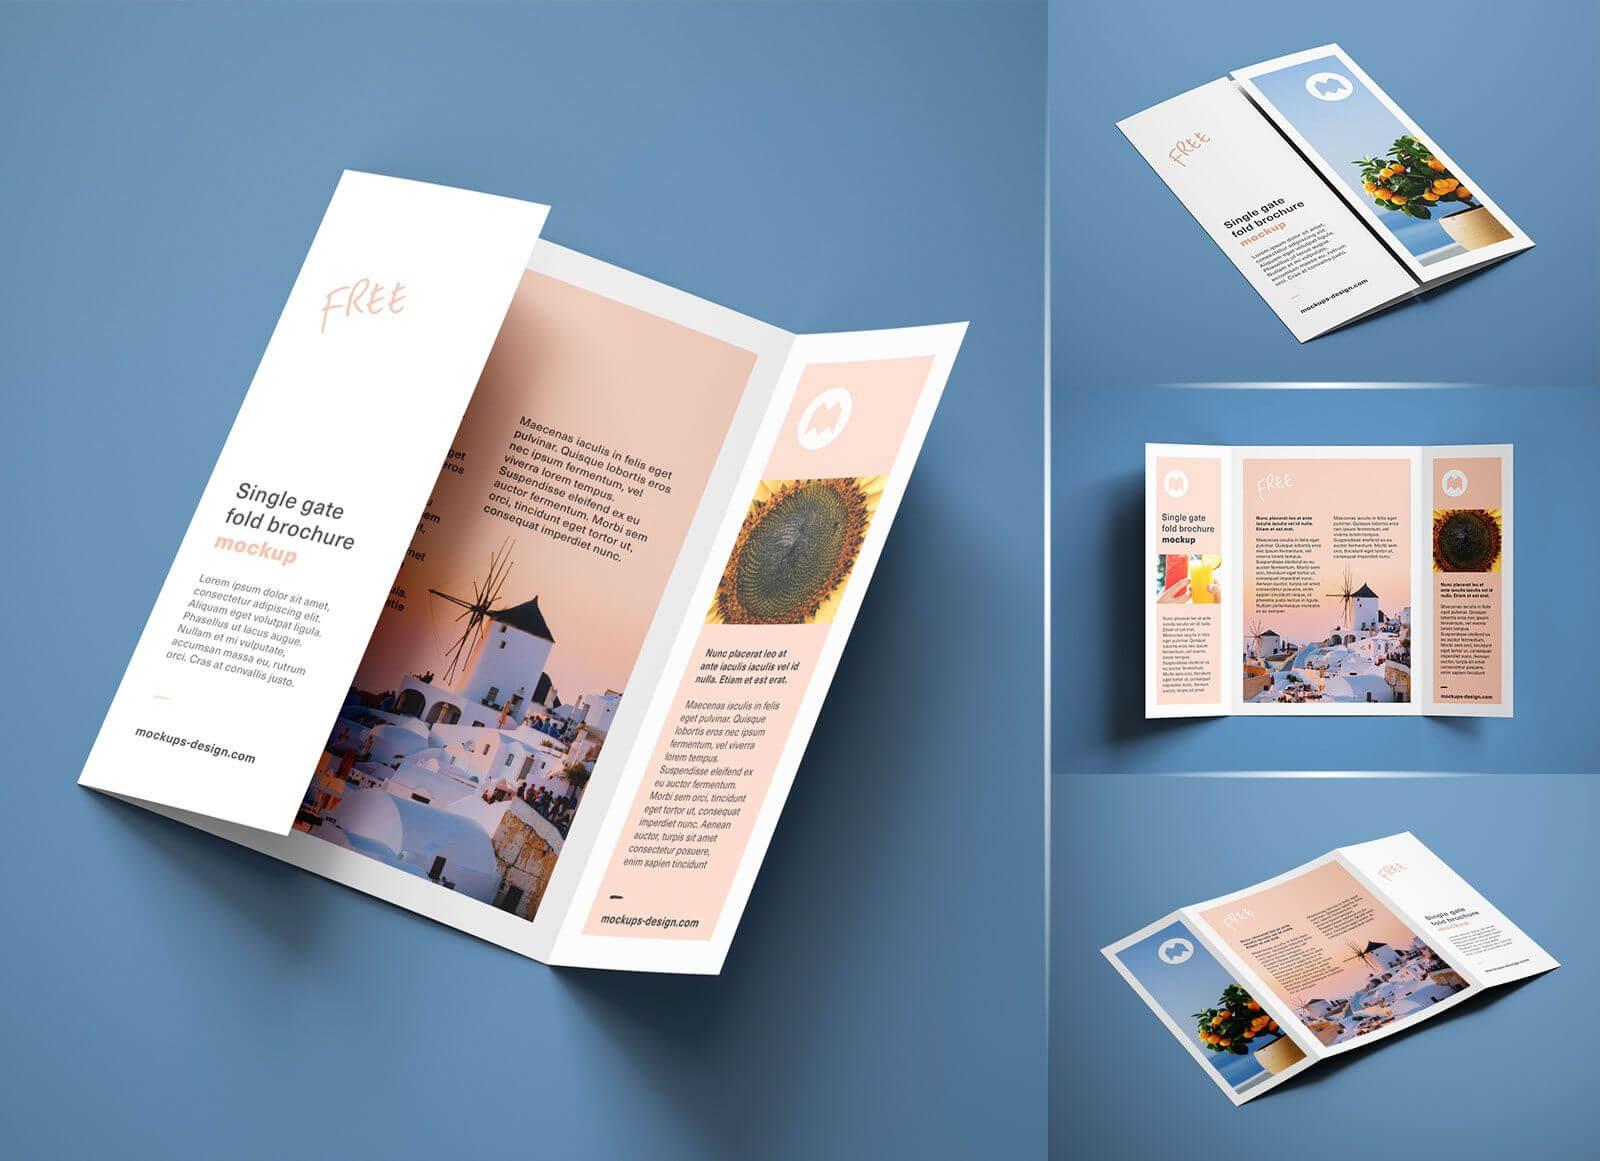 Free A4 Single Gate Fold Brochure Mockup Psd Set | Graphic Inside Single Page Brochure Templates Psd